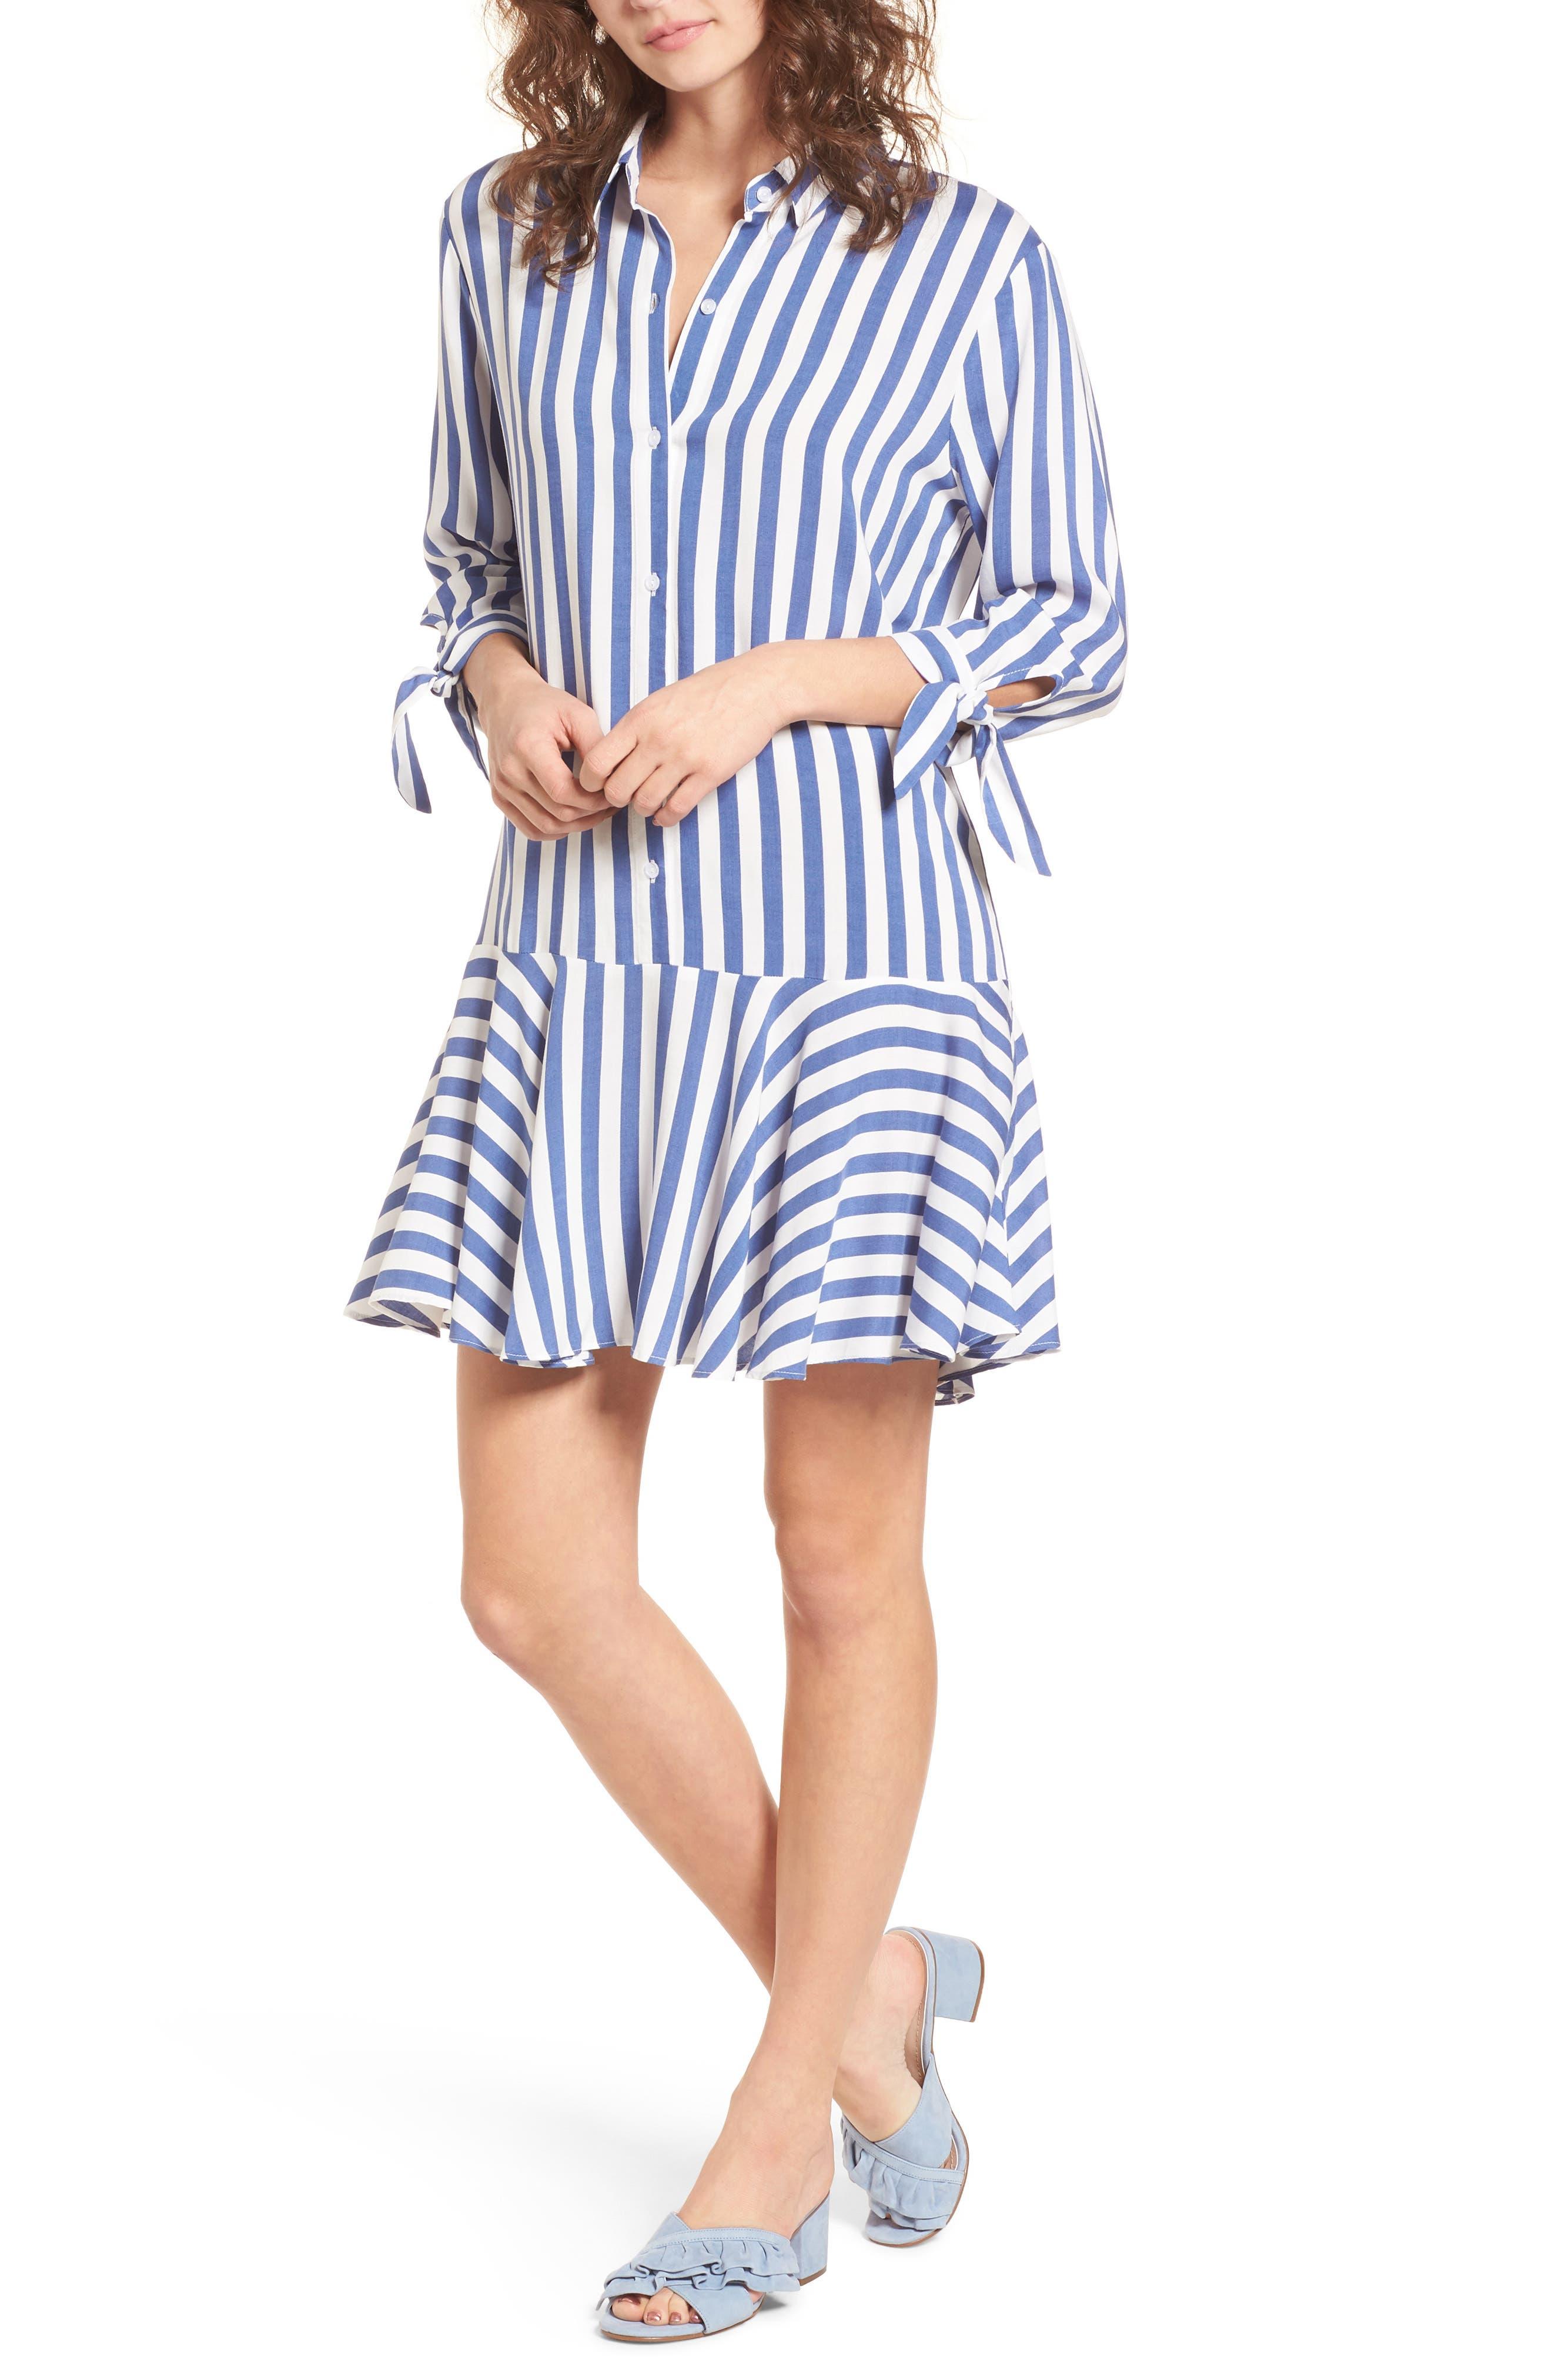 Main Image - One Clothing Drop Waist Shirtdress